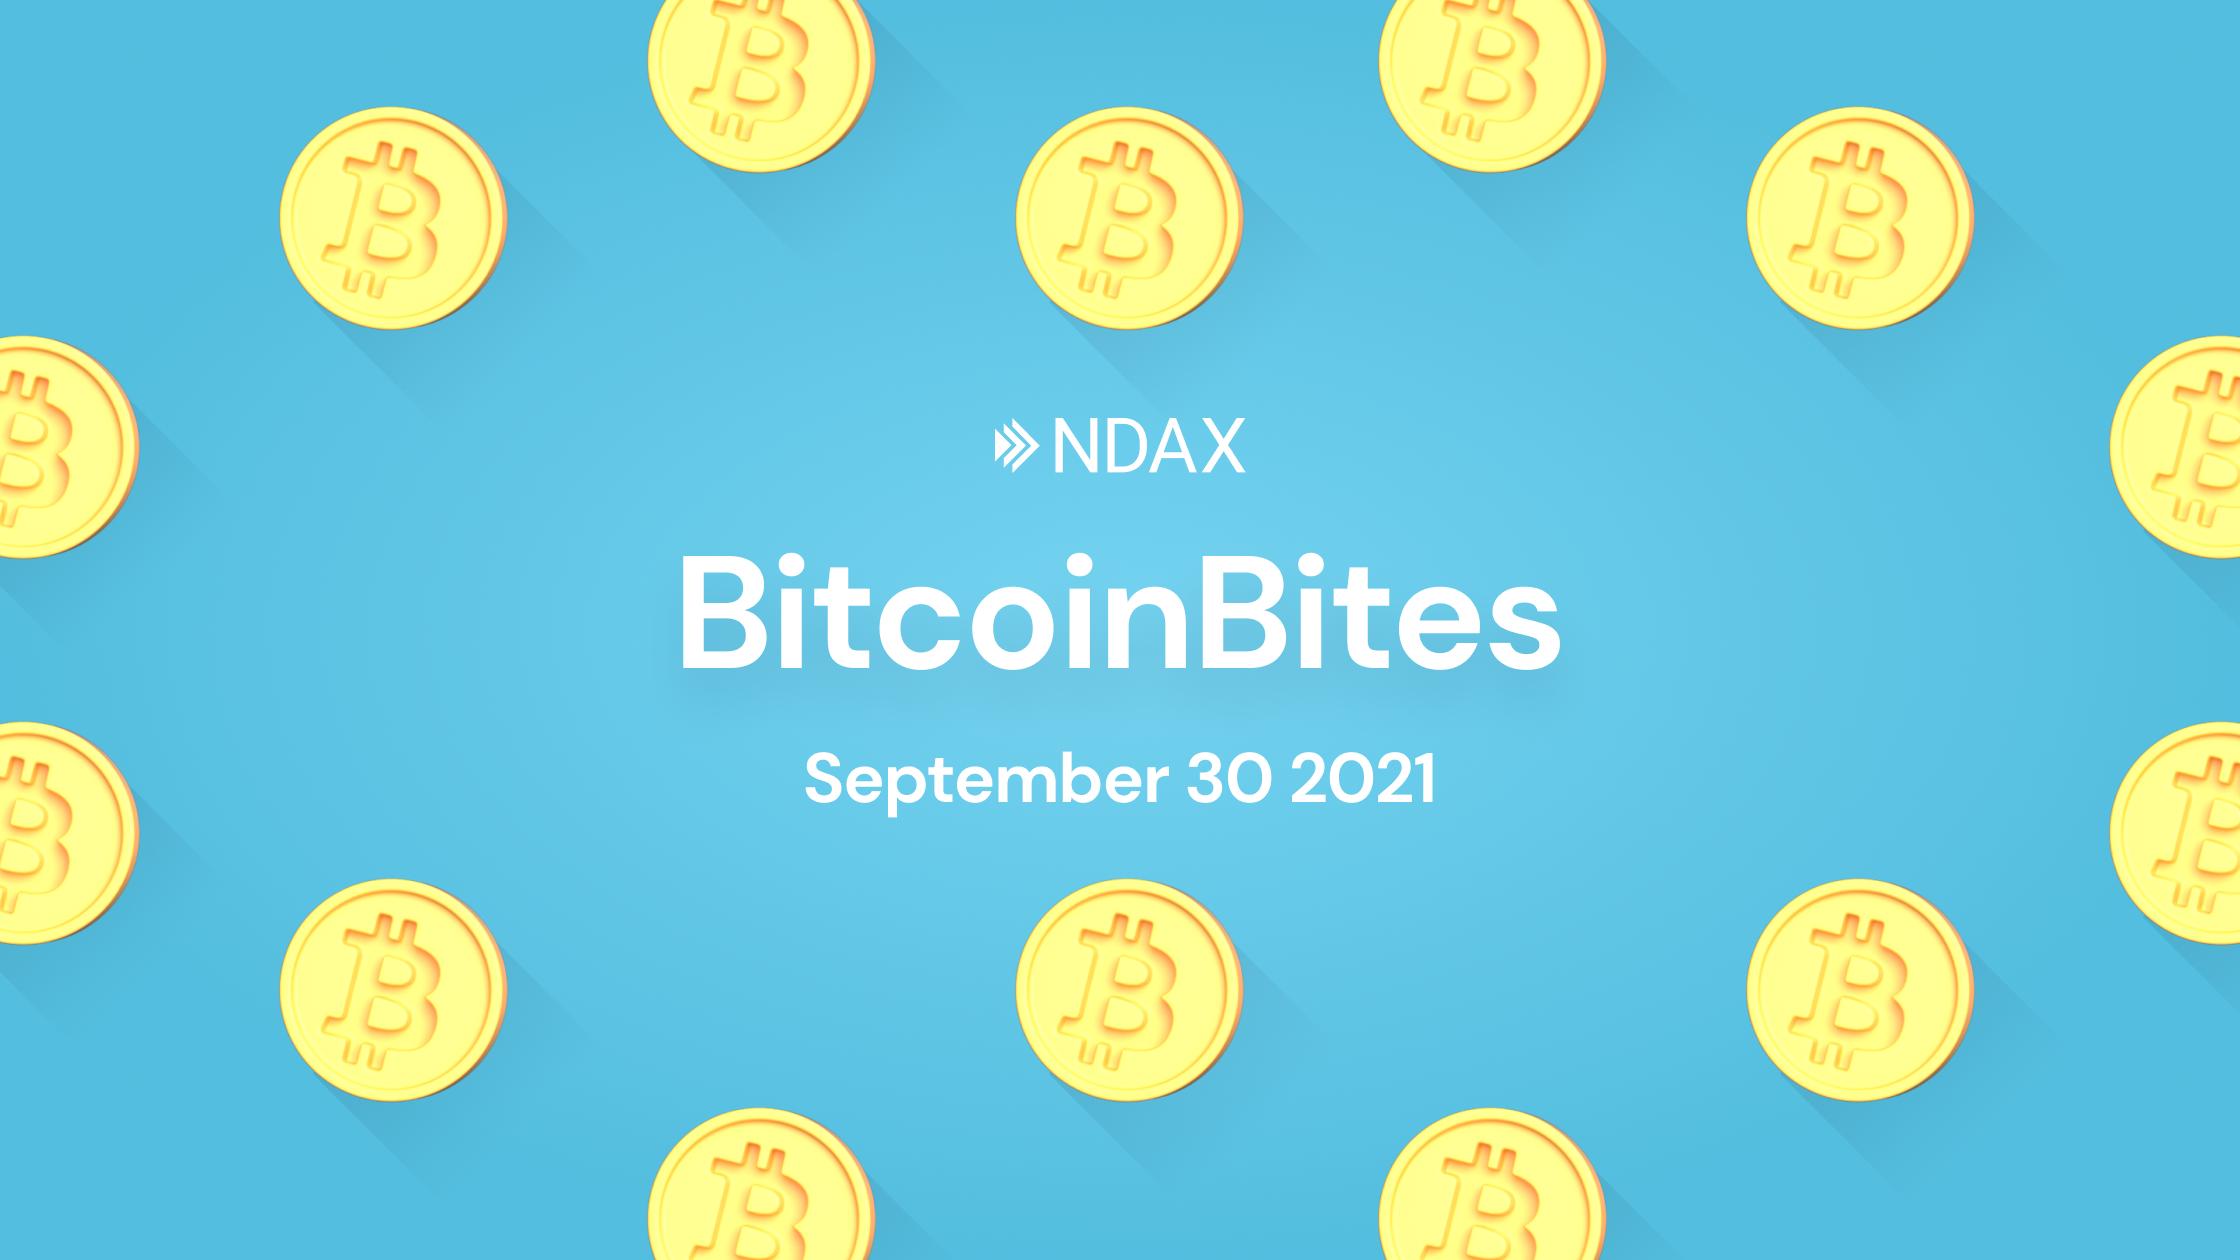 BitcoinBites: 5 BTC stories you should know – September 30th, 2021